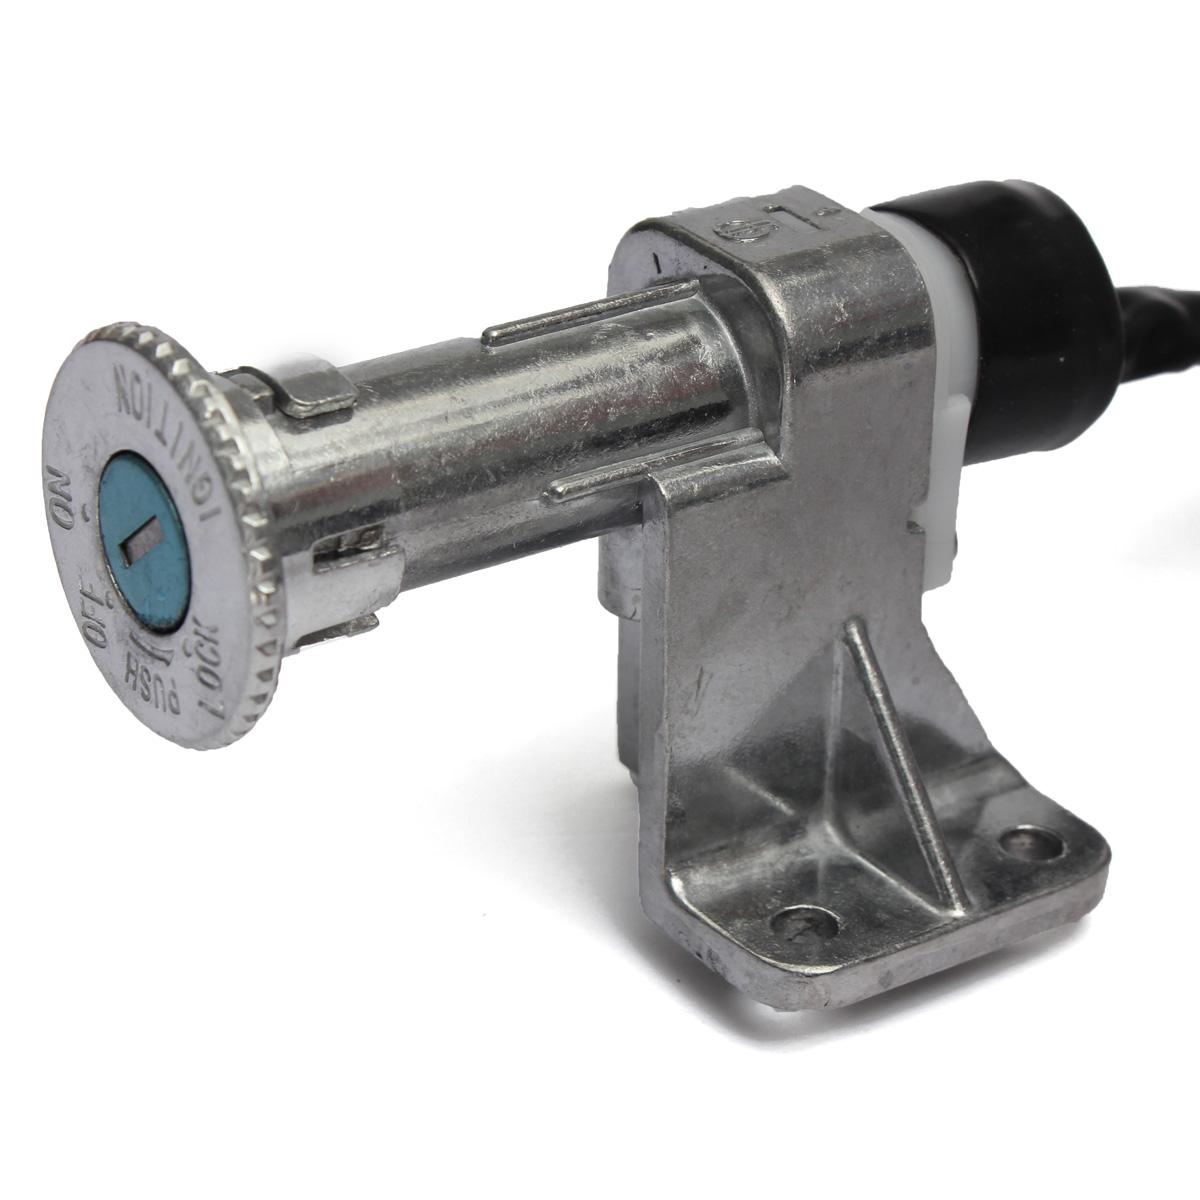 Schwinn Braided Steel Lock Instructions